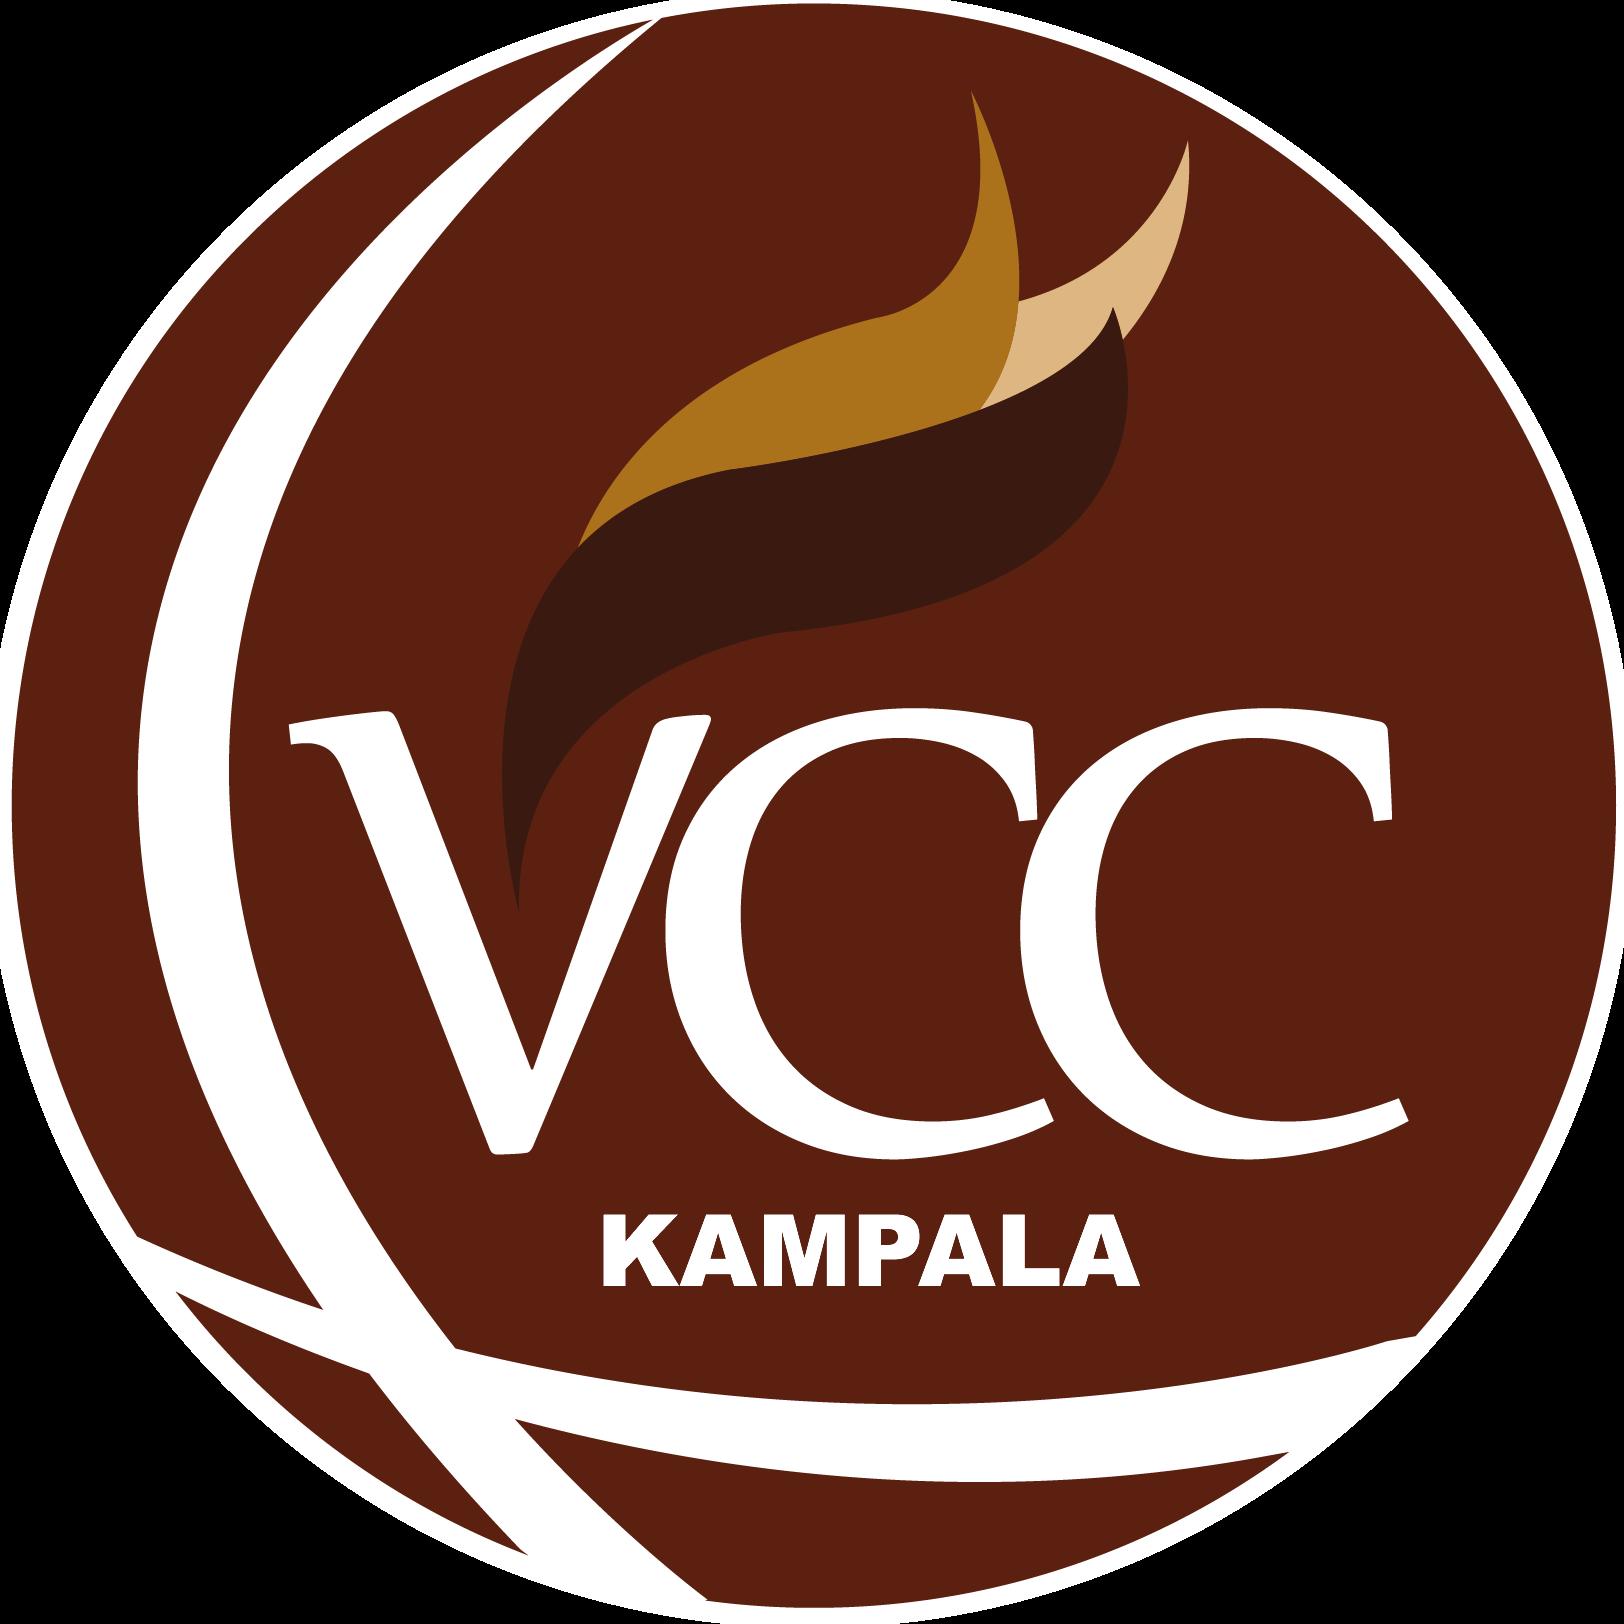 Victory City Church – Kampala